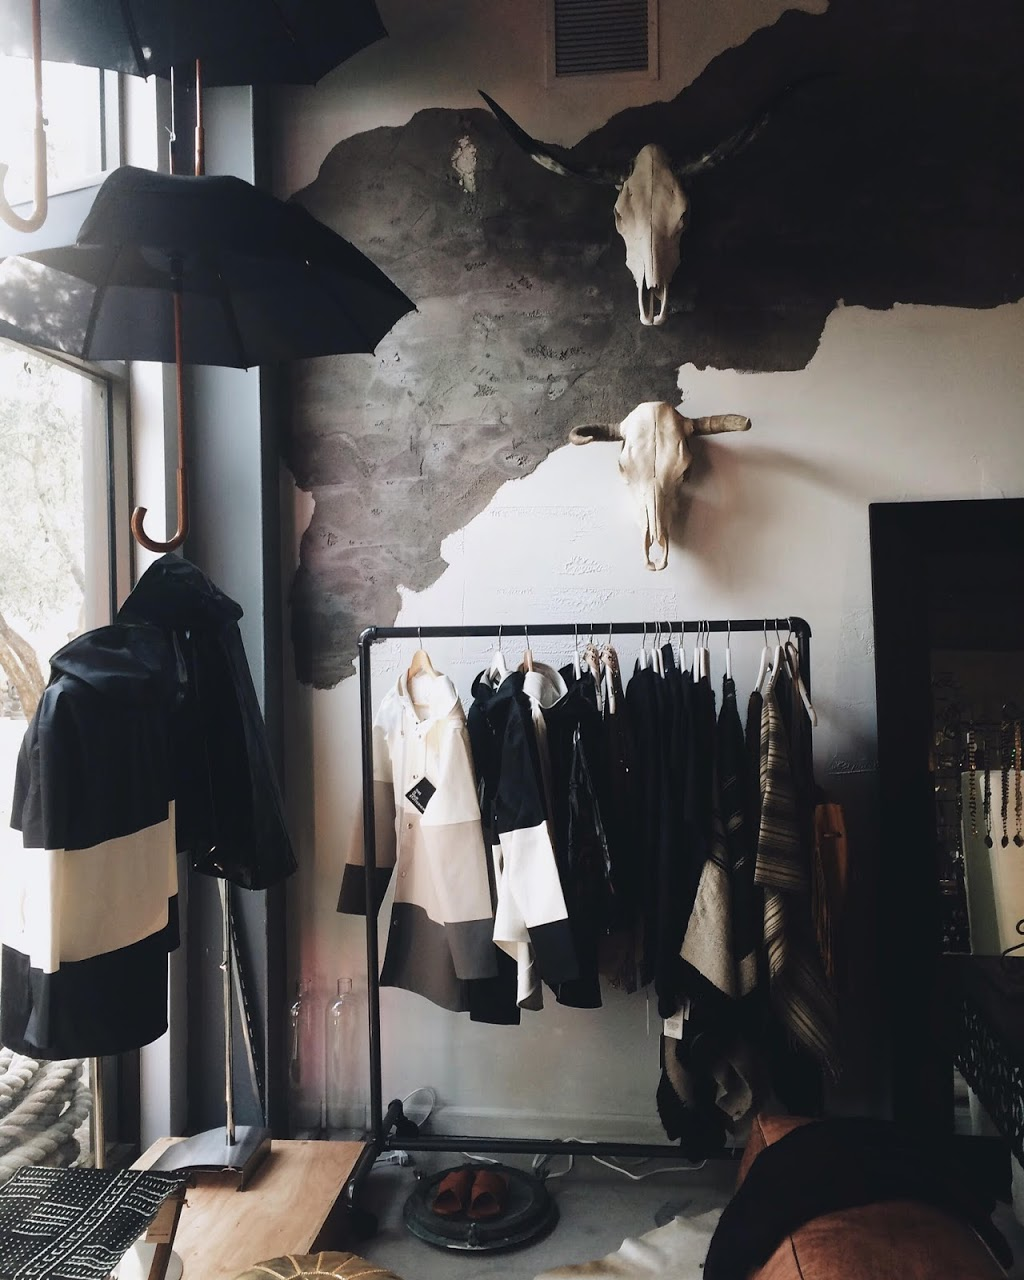 Nomad Chic - clothing store    Photo 10 of 10   Address: 23570 Arnold Dr, Sonoma, CA 95476, USA   Phone: (415) 381-9087